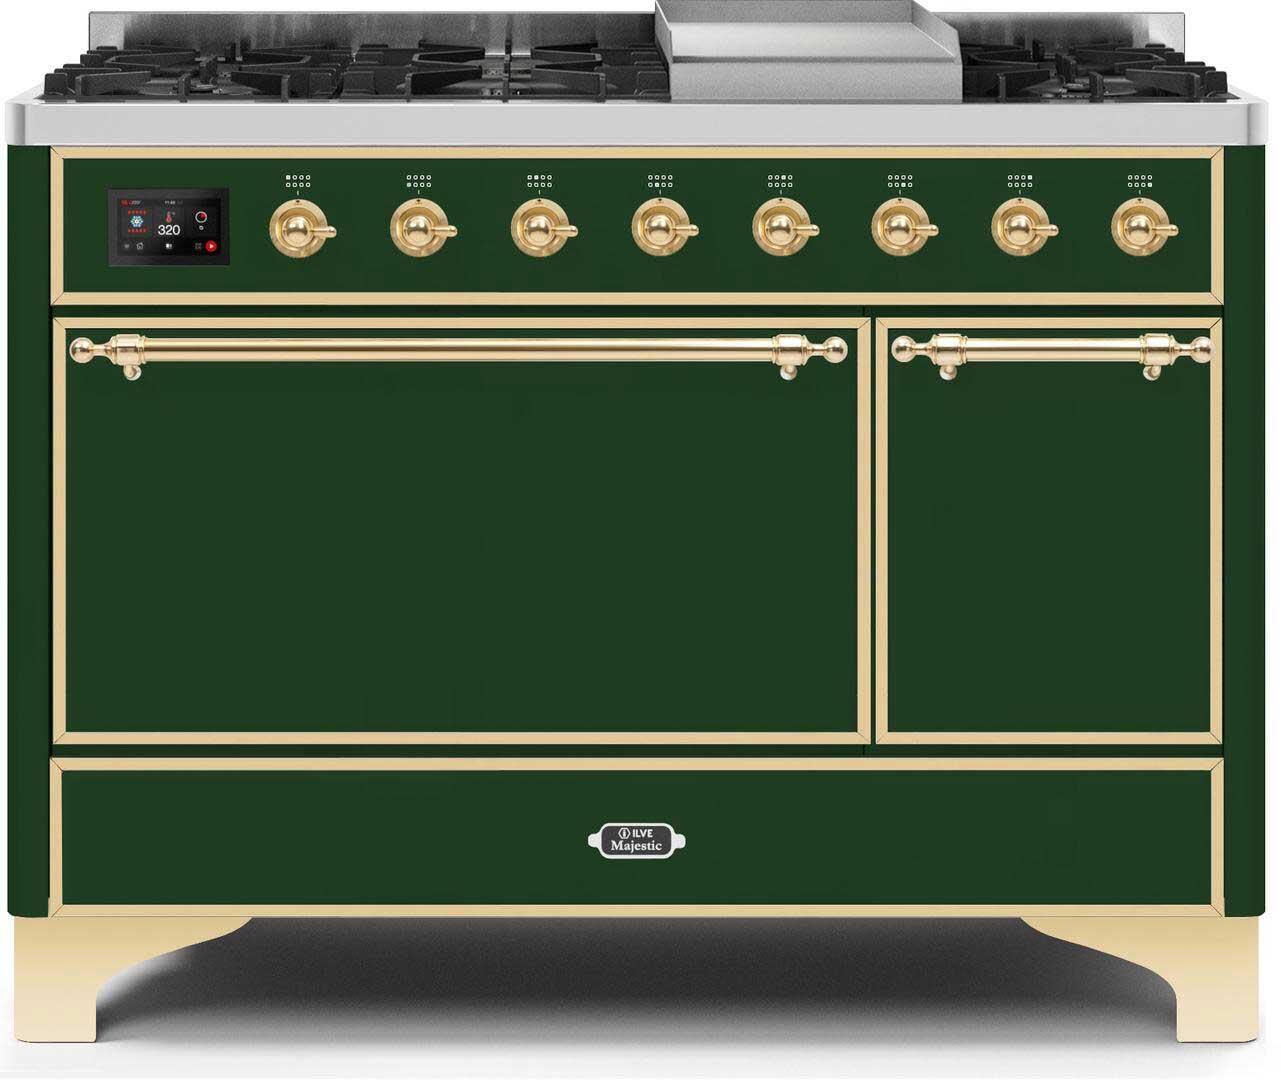 Ilve Majestic II UM12FDQNS3EGG Freestanding Dual Fuel Range Green, UM12FDQNS3EGGNG-Front-CD-A